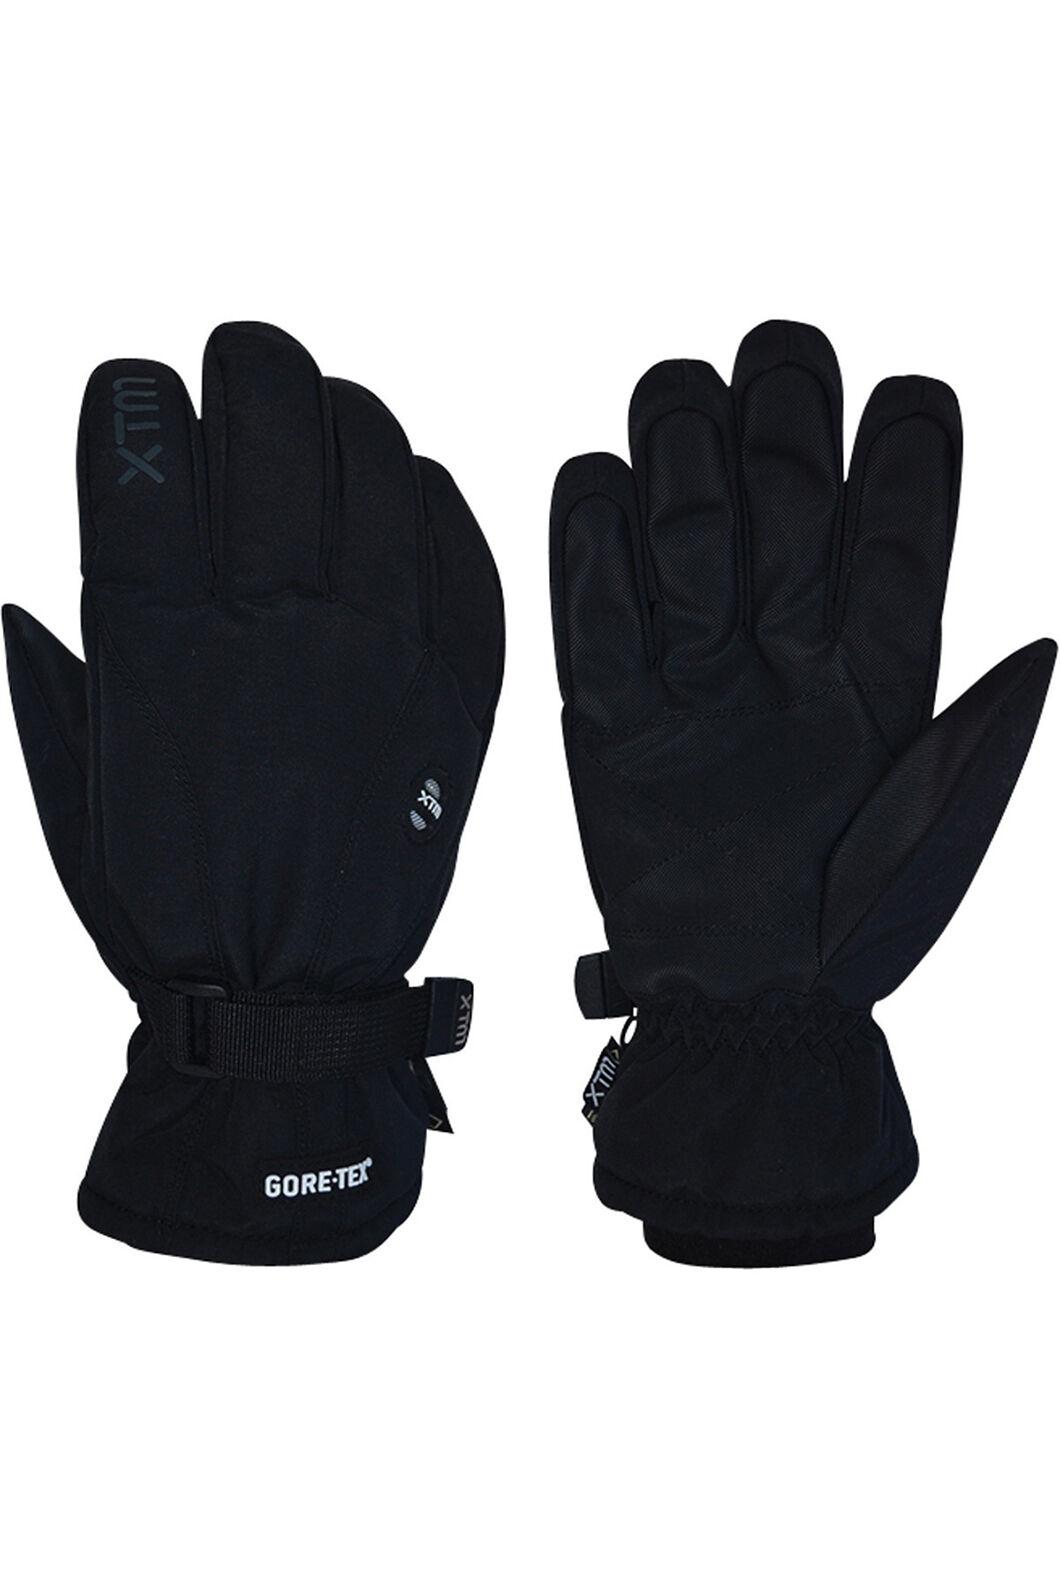 XTM Whistler Gloves - Men's, Black, hi-res